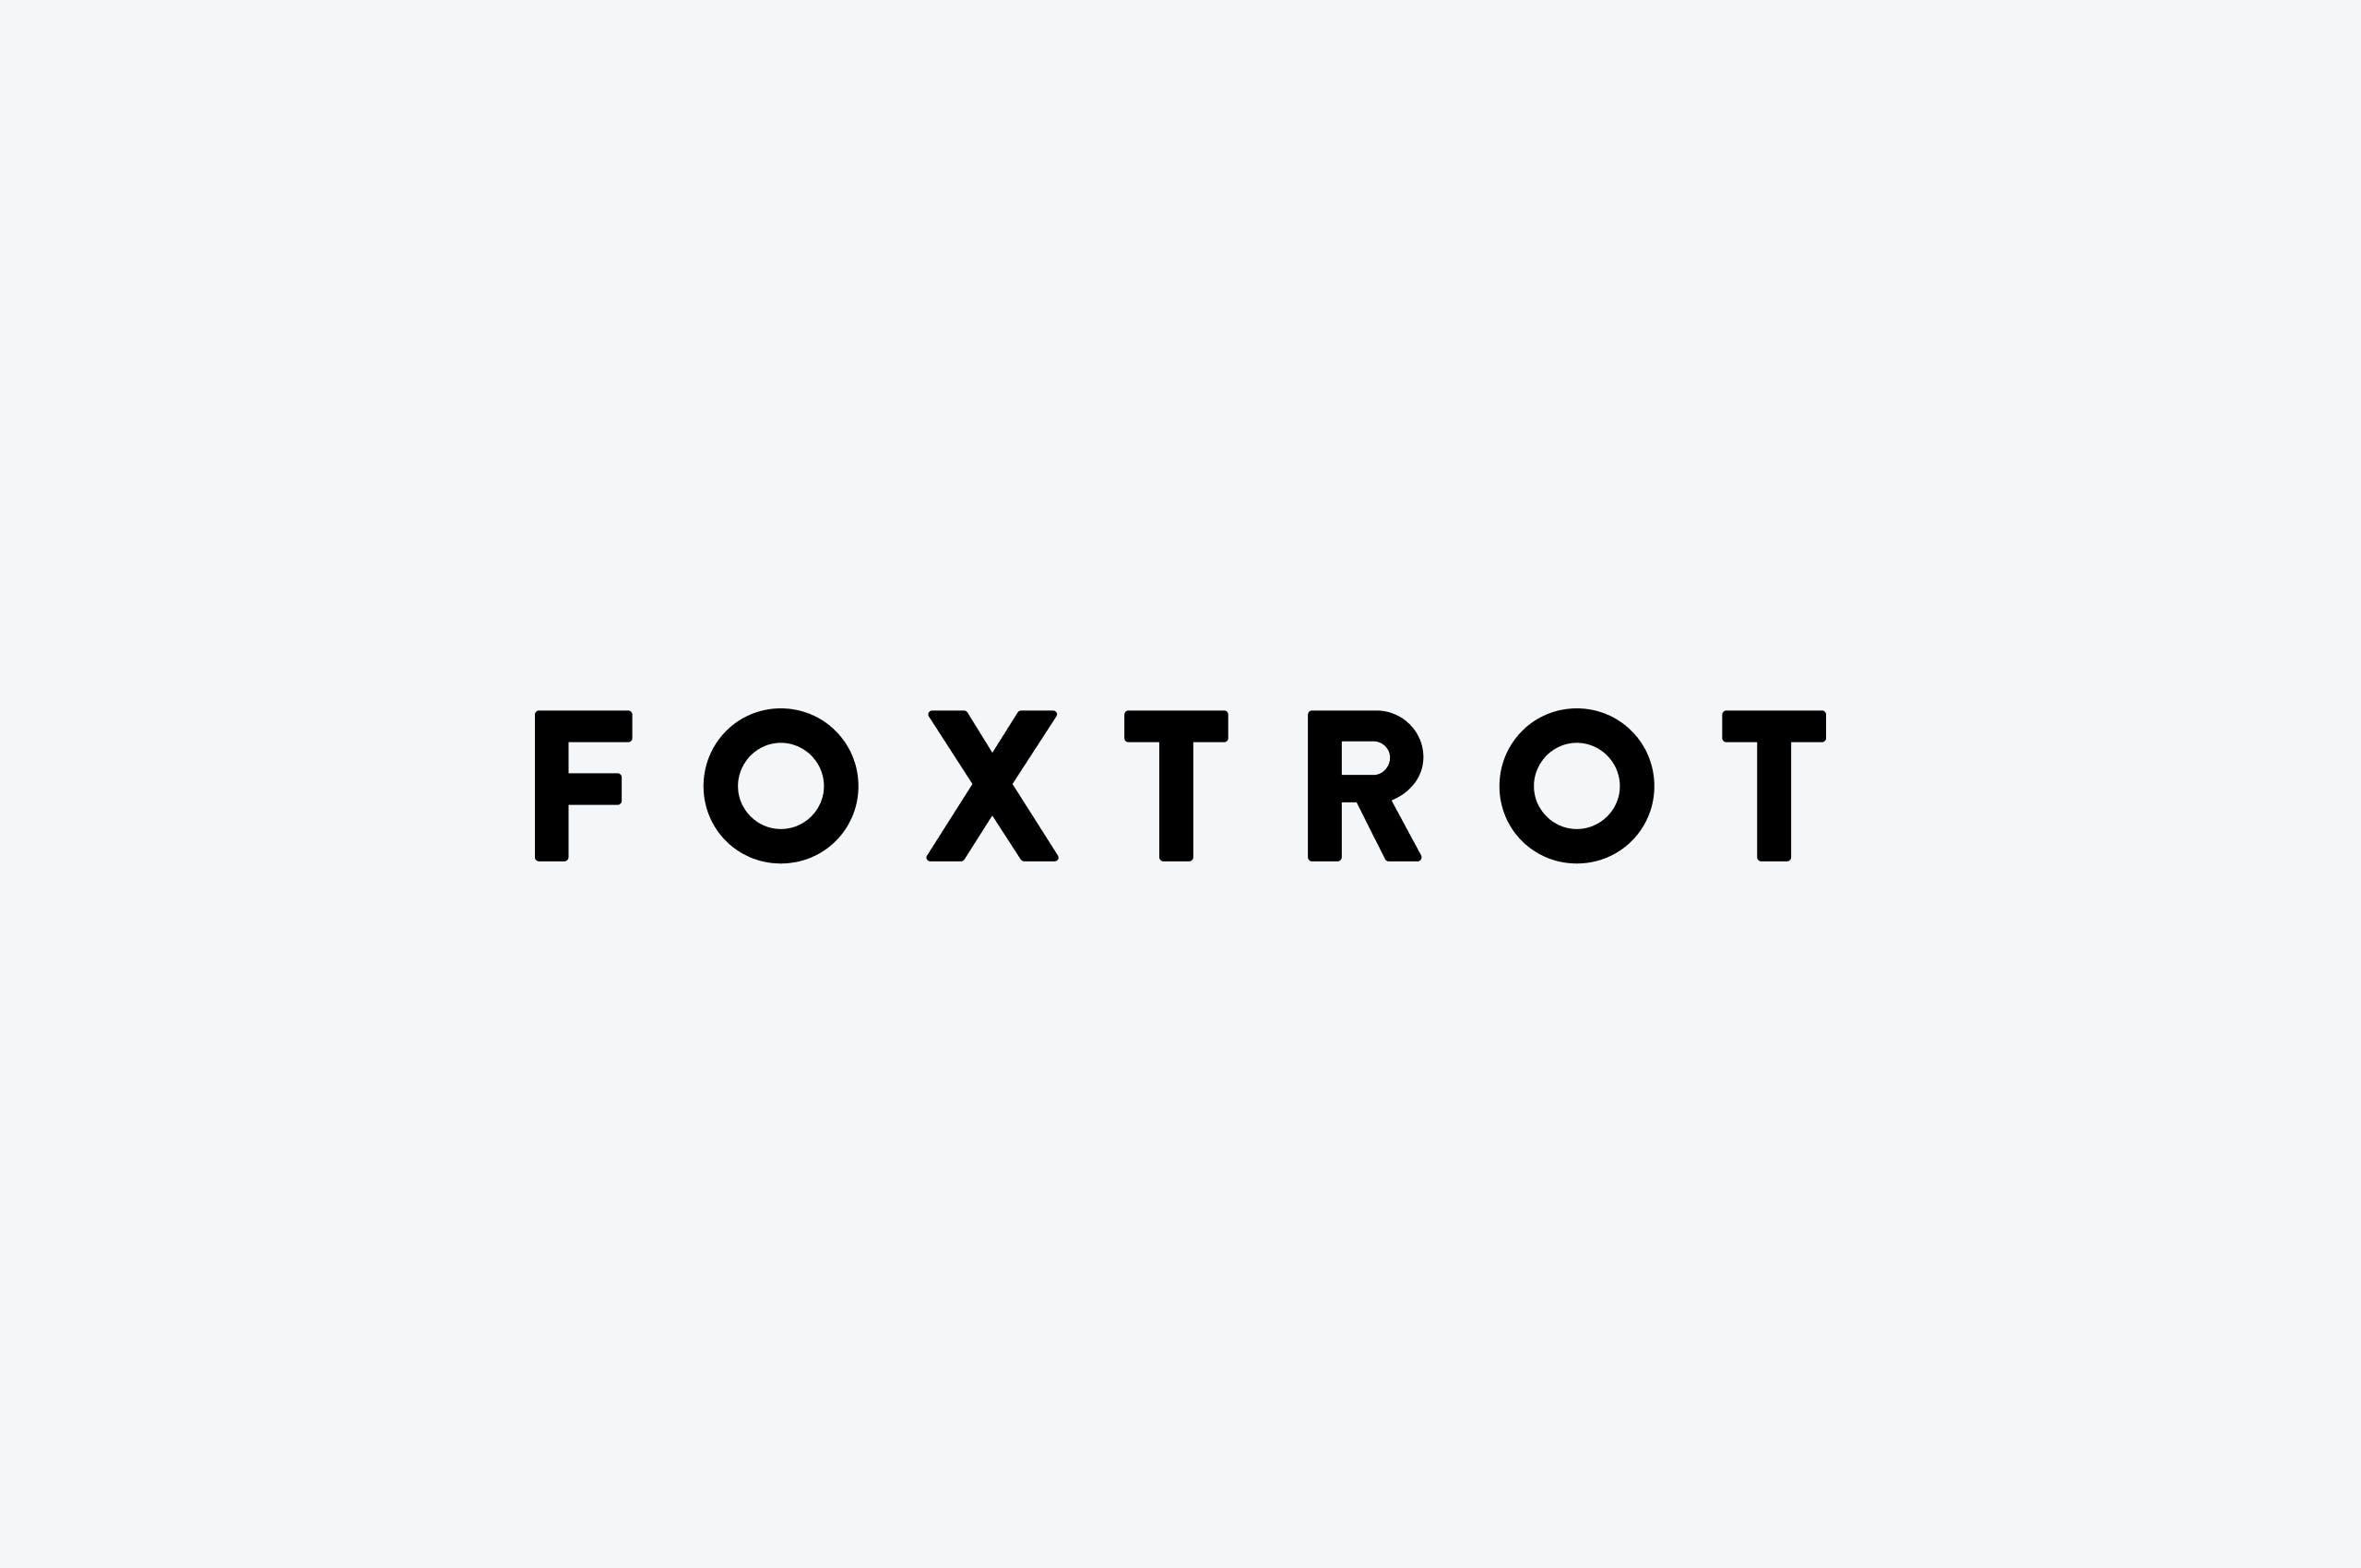 foxtrot-logotype